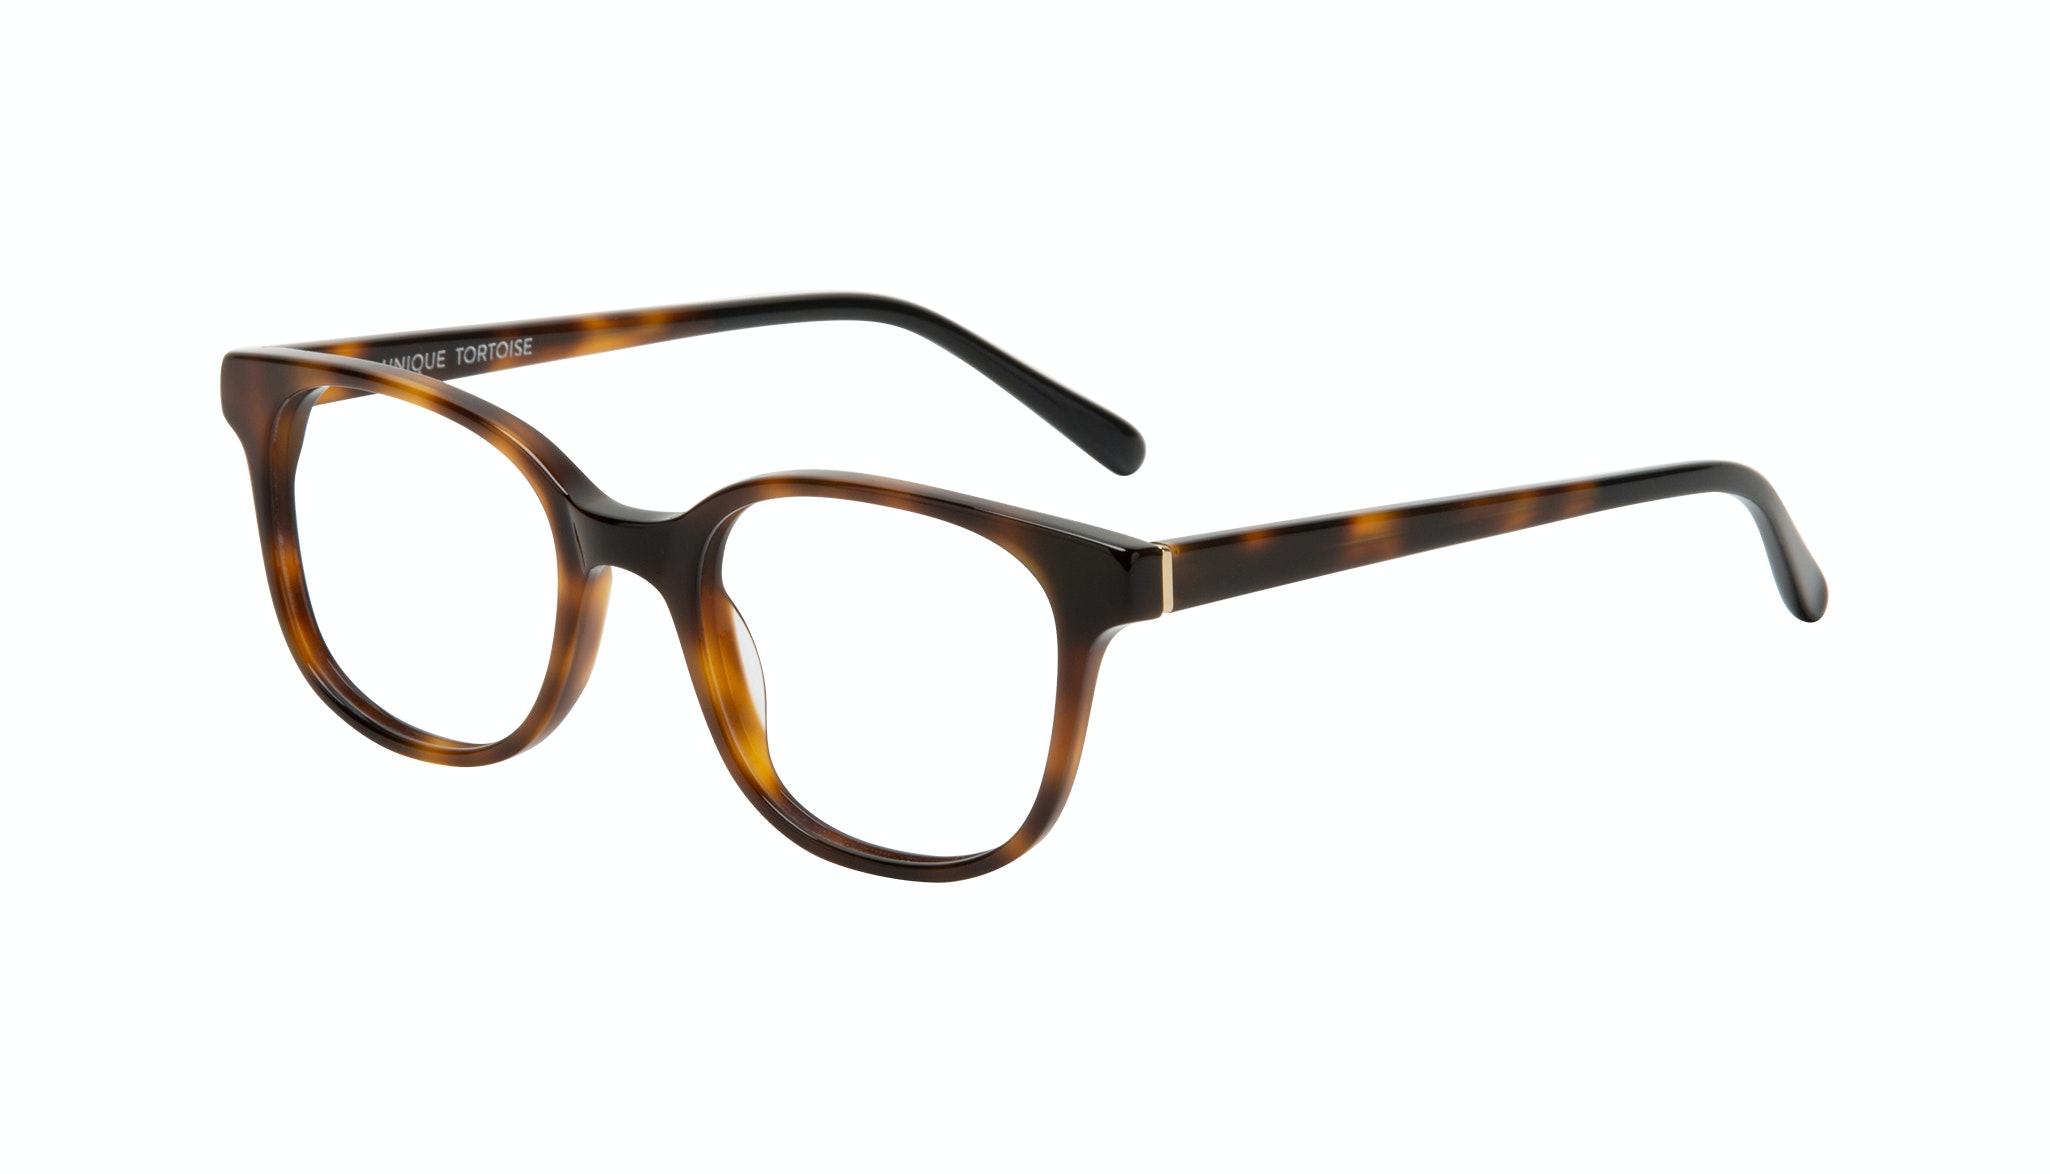 Affordable Fashion Glasses Square Eyeglasses Women Unique Tortoise Tilt